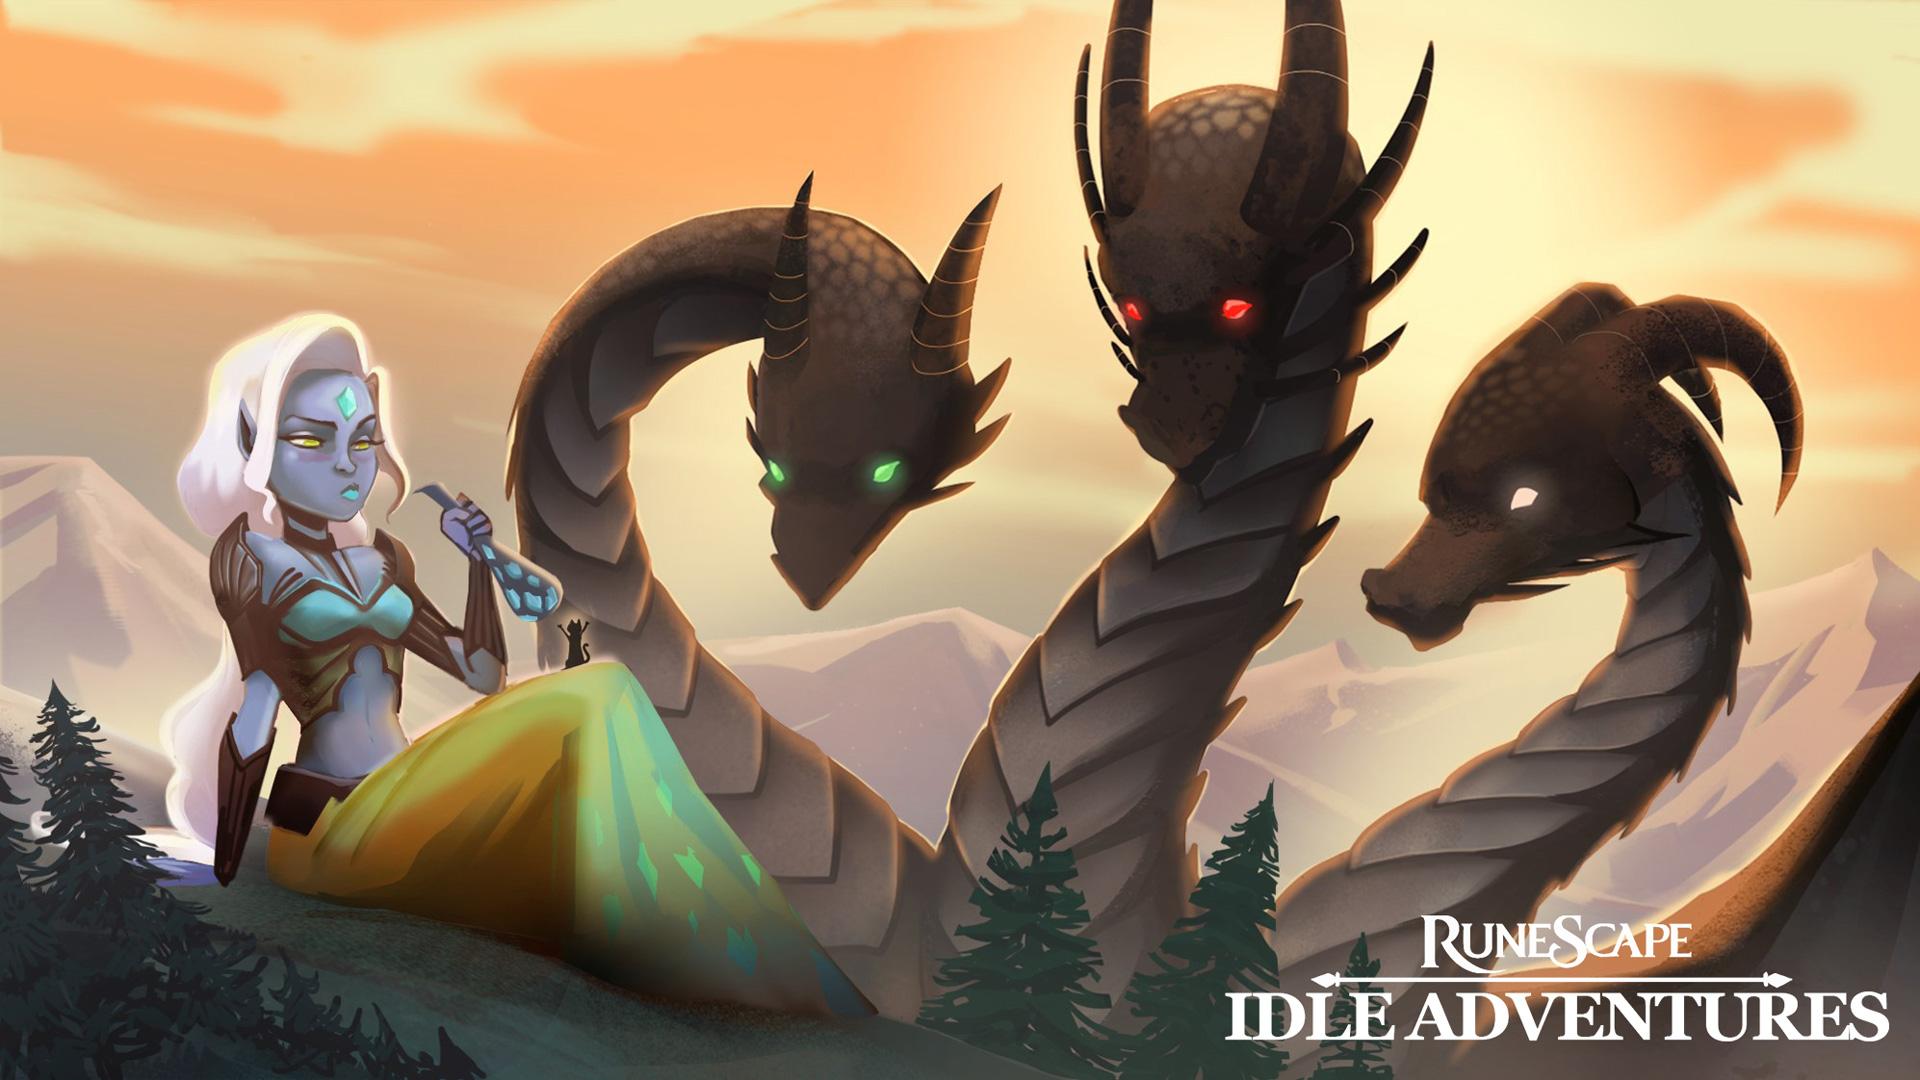 Runescape-idle-adventures